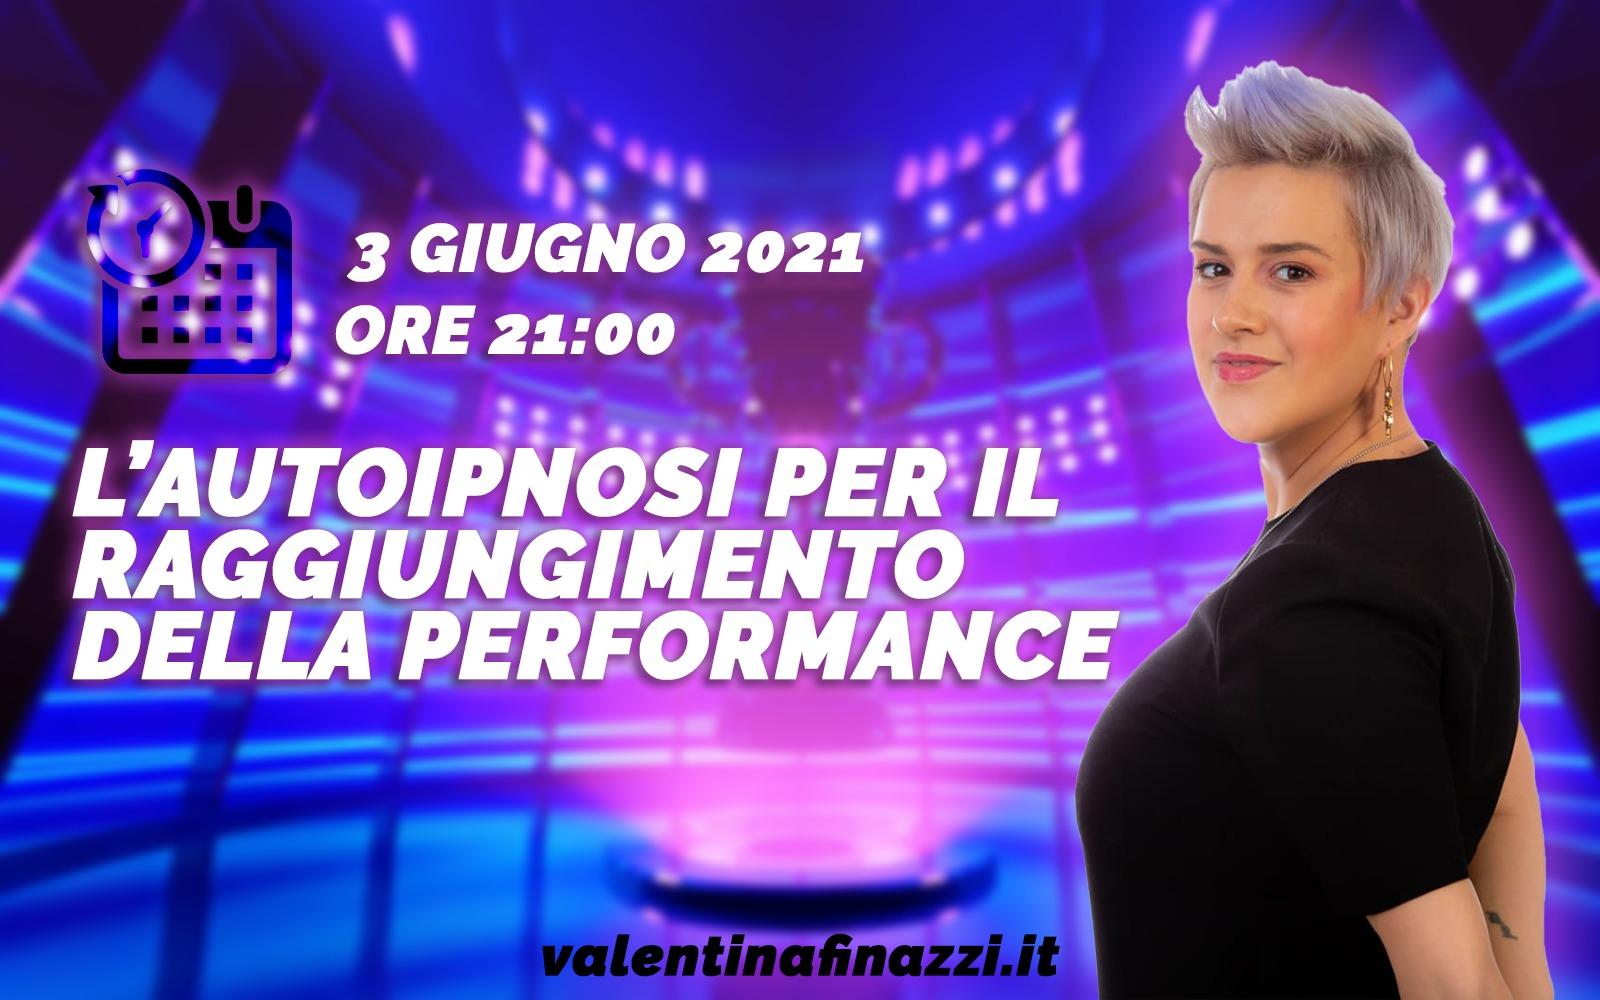 Valentina Finazzi – The Life Coach